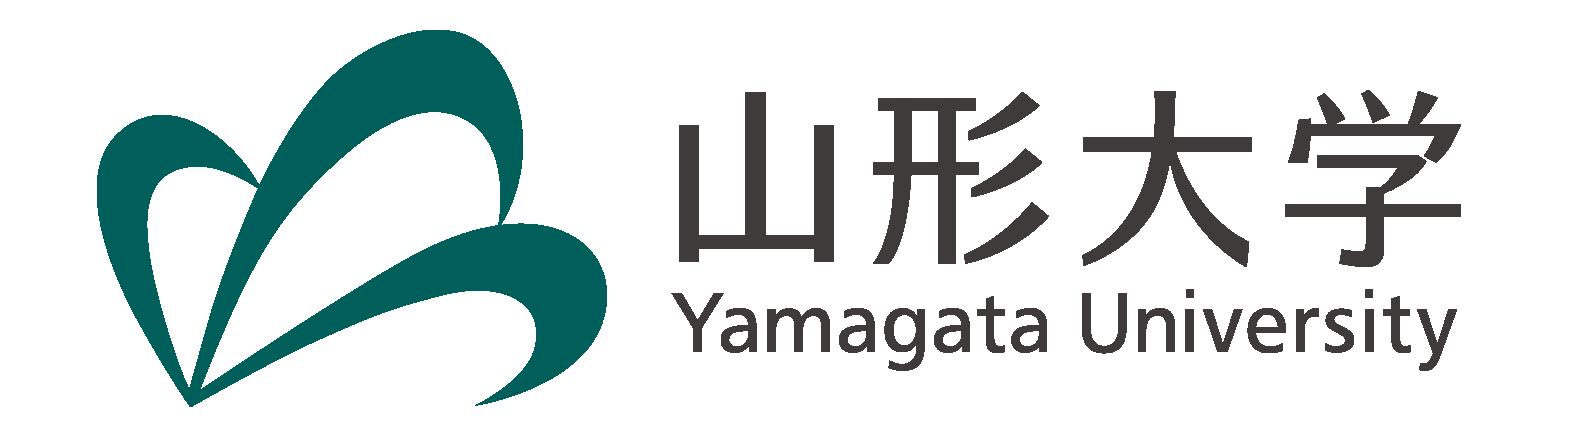 yamagata-university-31558558